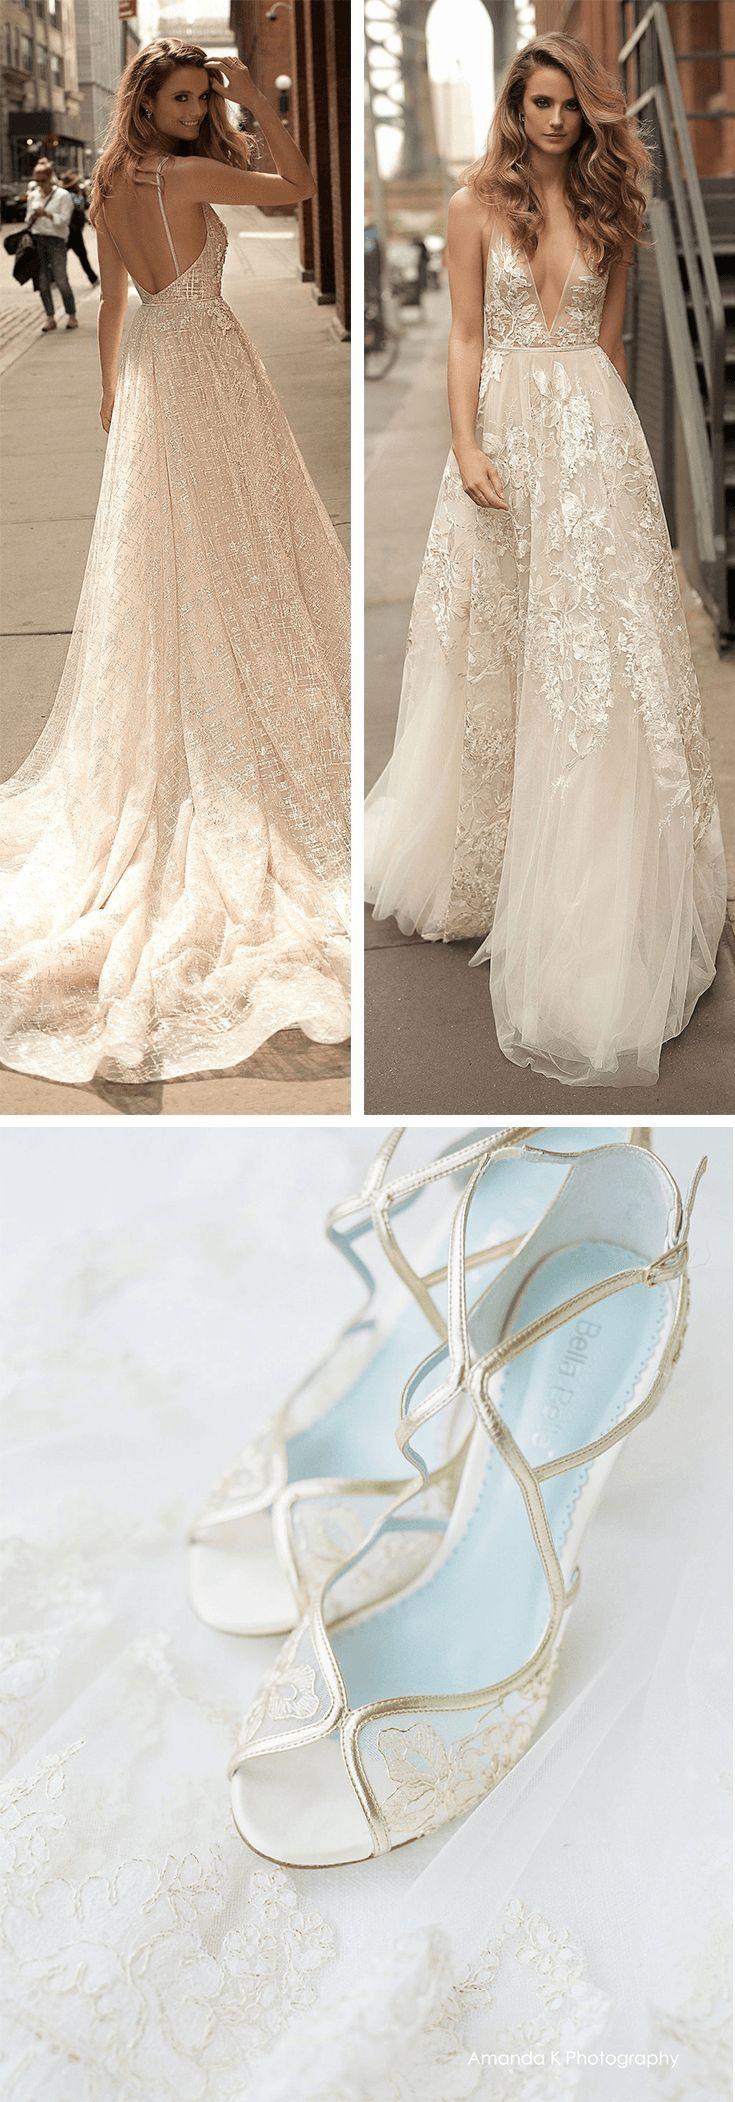 Tess - Gold Lace Vintage Wedding Shoes